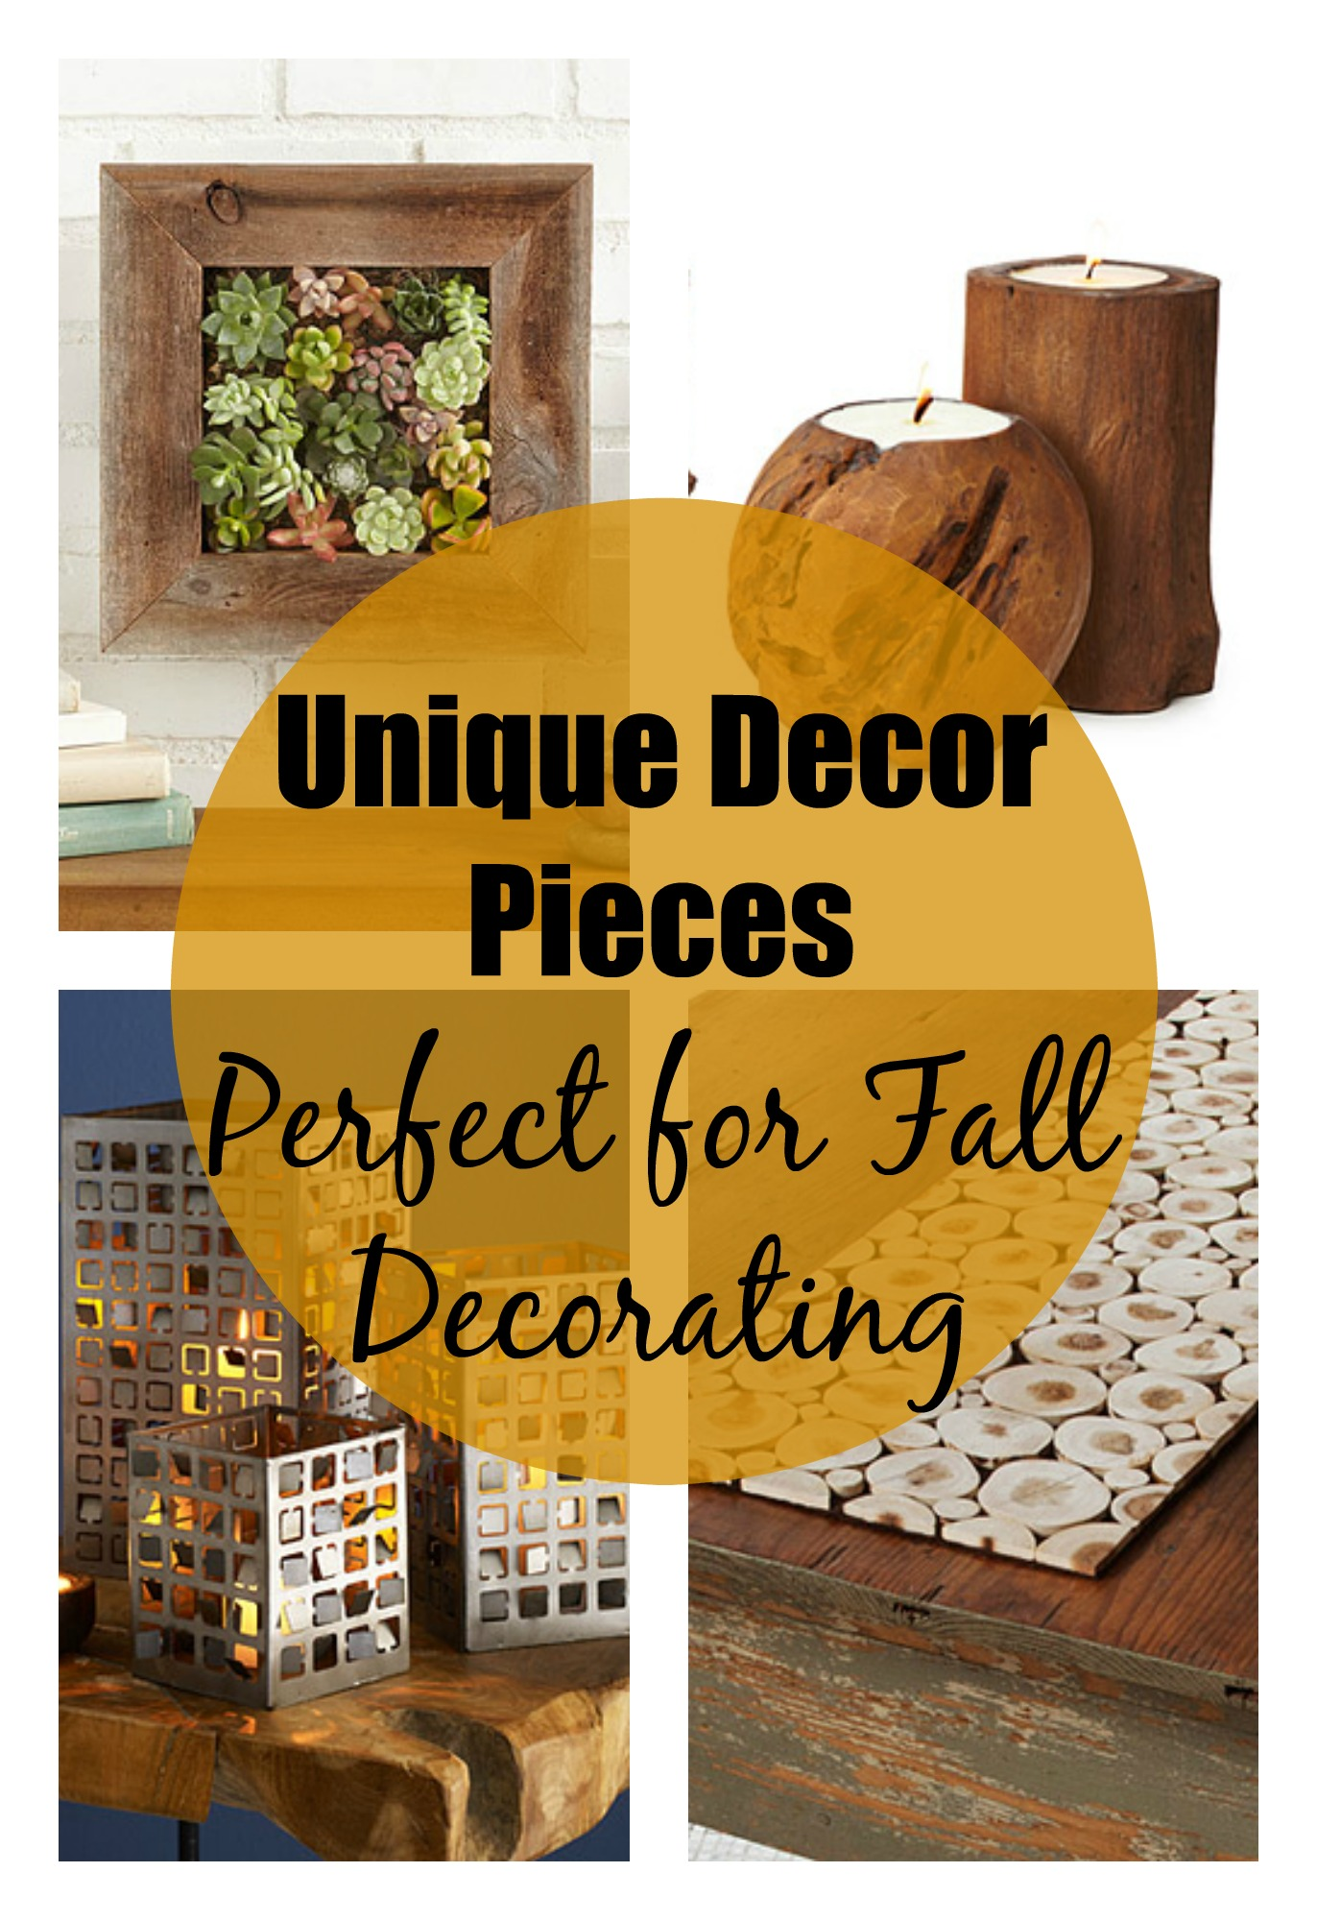 Unique Decor Pieces Perfect for Fall Decorating